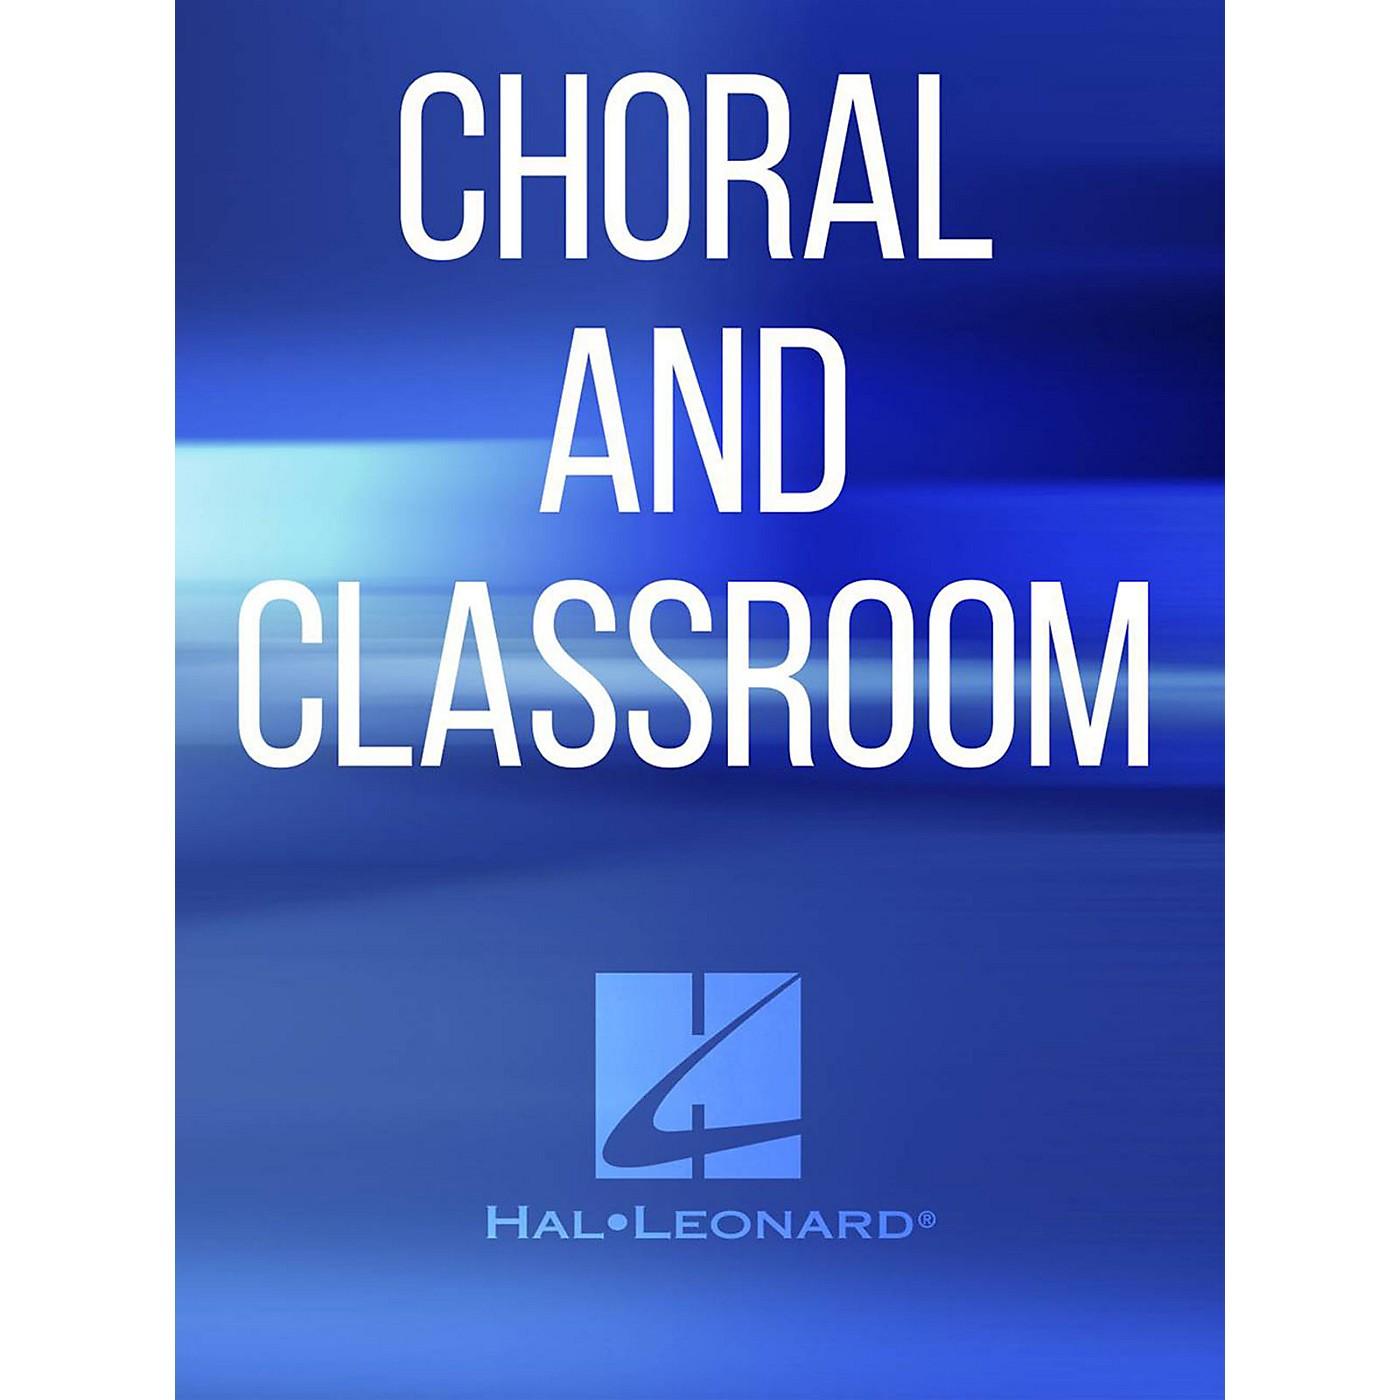 Hal Leonard Johnson Boys (Discovery Level 2) VoiceTrax CD Arranged by Cristi Cary Miller thumbnail